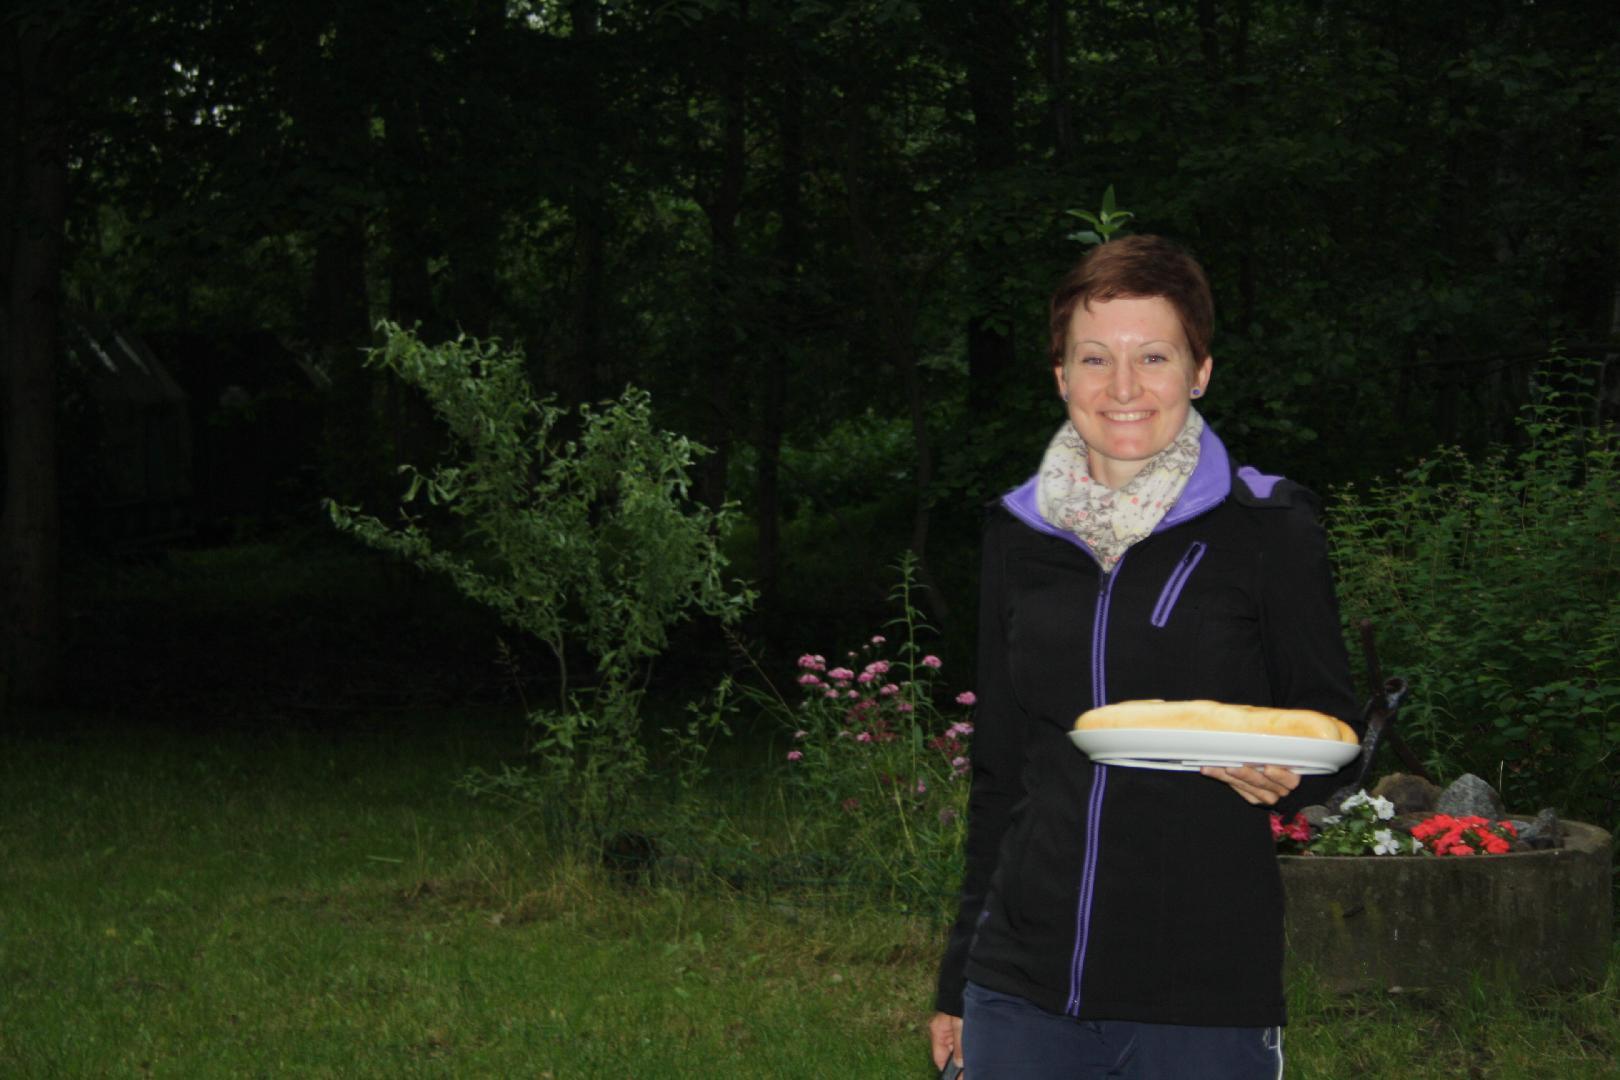 07 Jugendwartvertreterin Anika bringt das Baguette